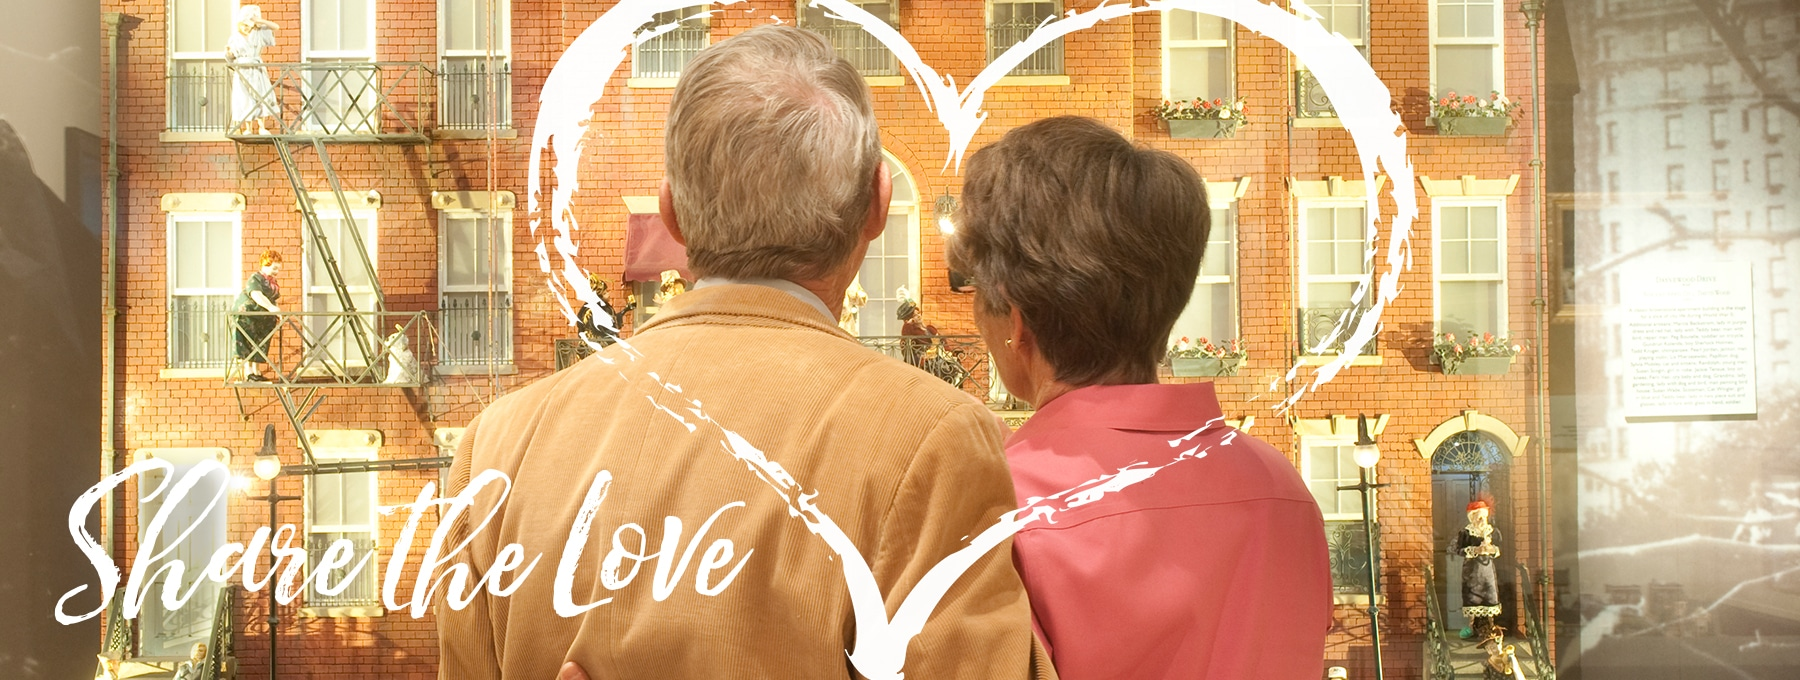 Share the Love- Membership banner